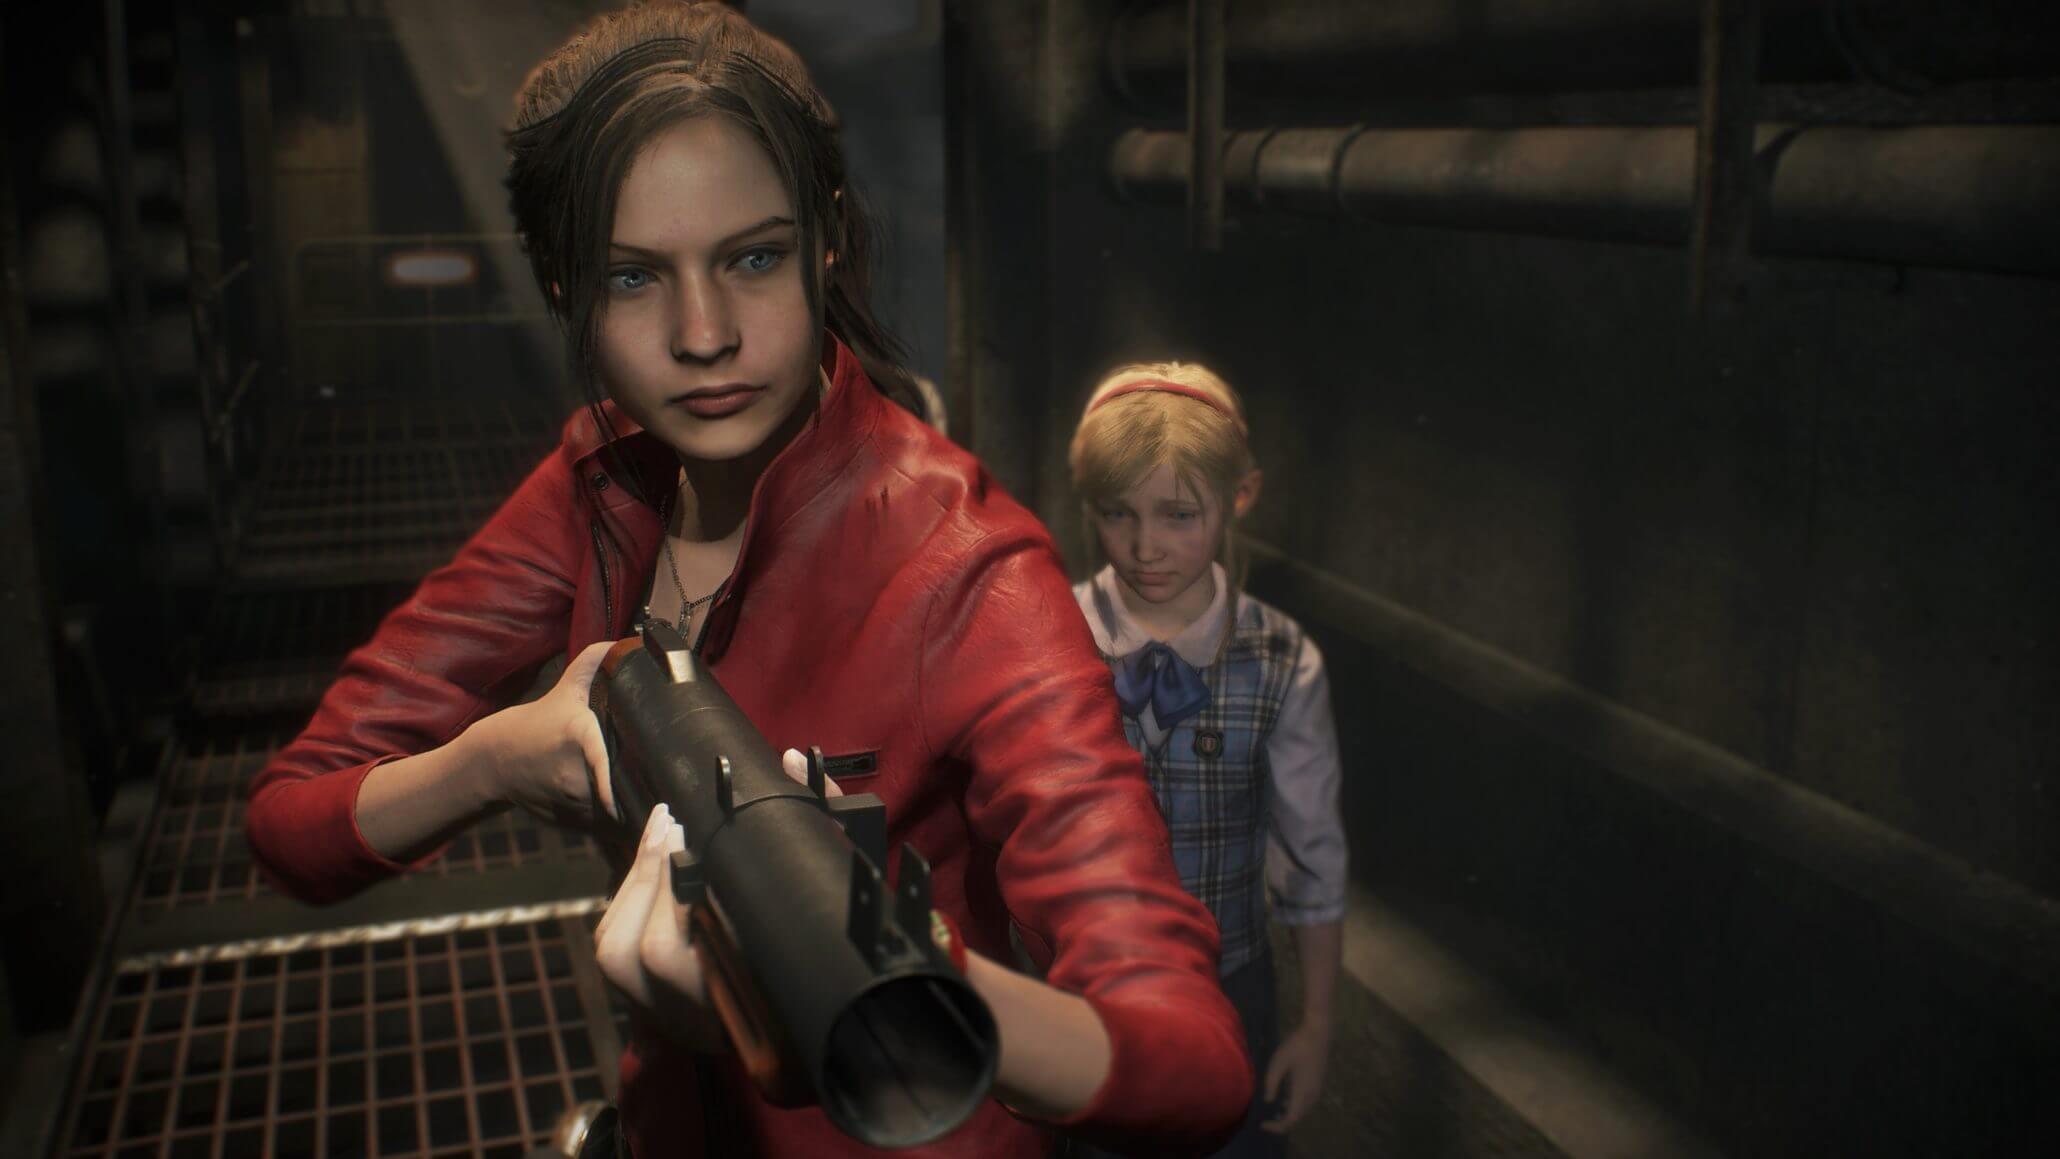 Resident evil 5 секс криса и джилл